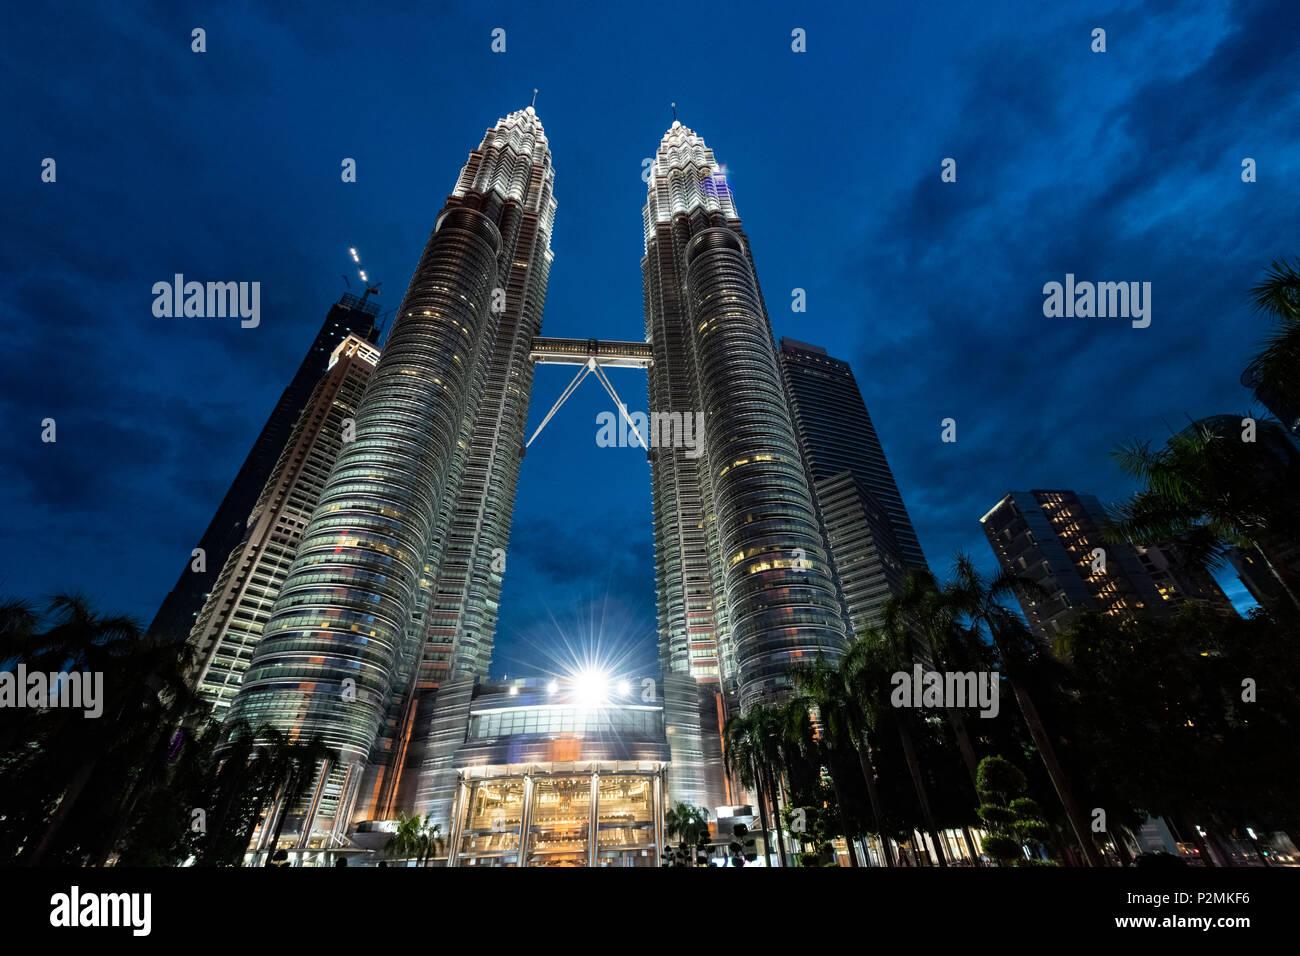 The Petronus Towers, Kuala Lumpur, Malaysia - Stock Image